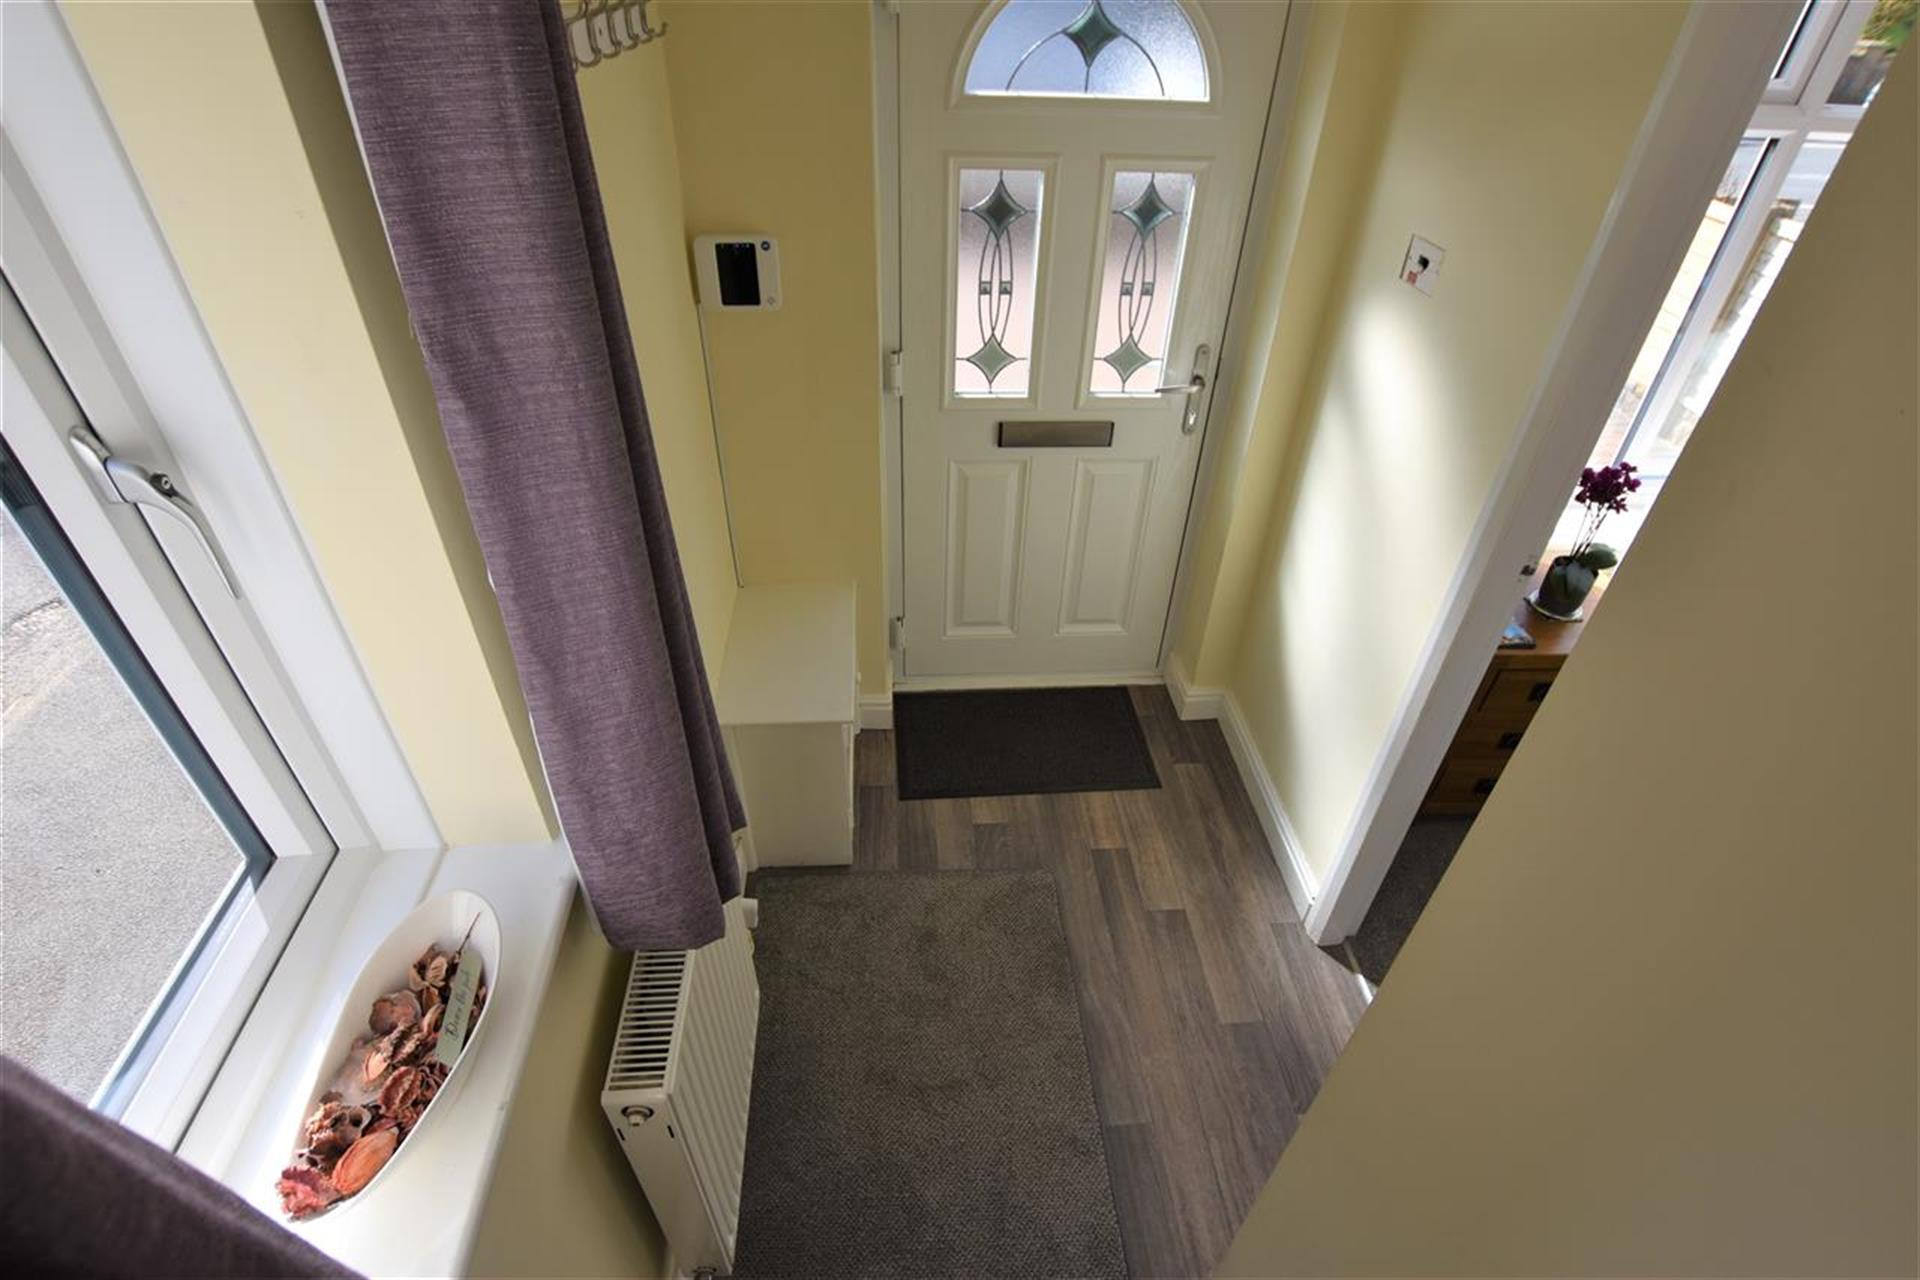 3 Bedroom Semi-detached House For Sale - Entrance Hall